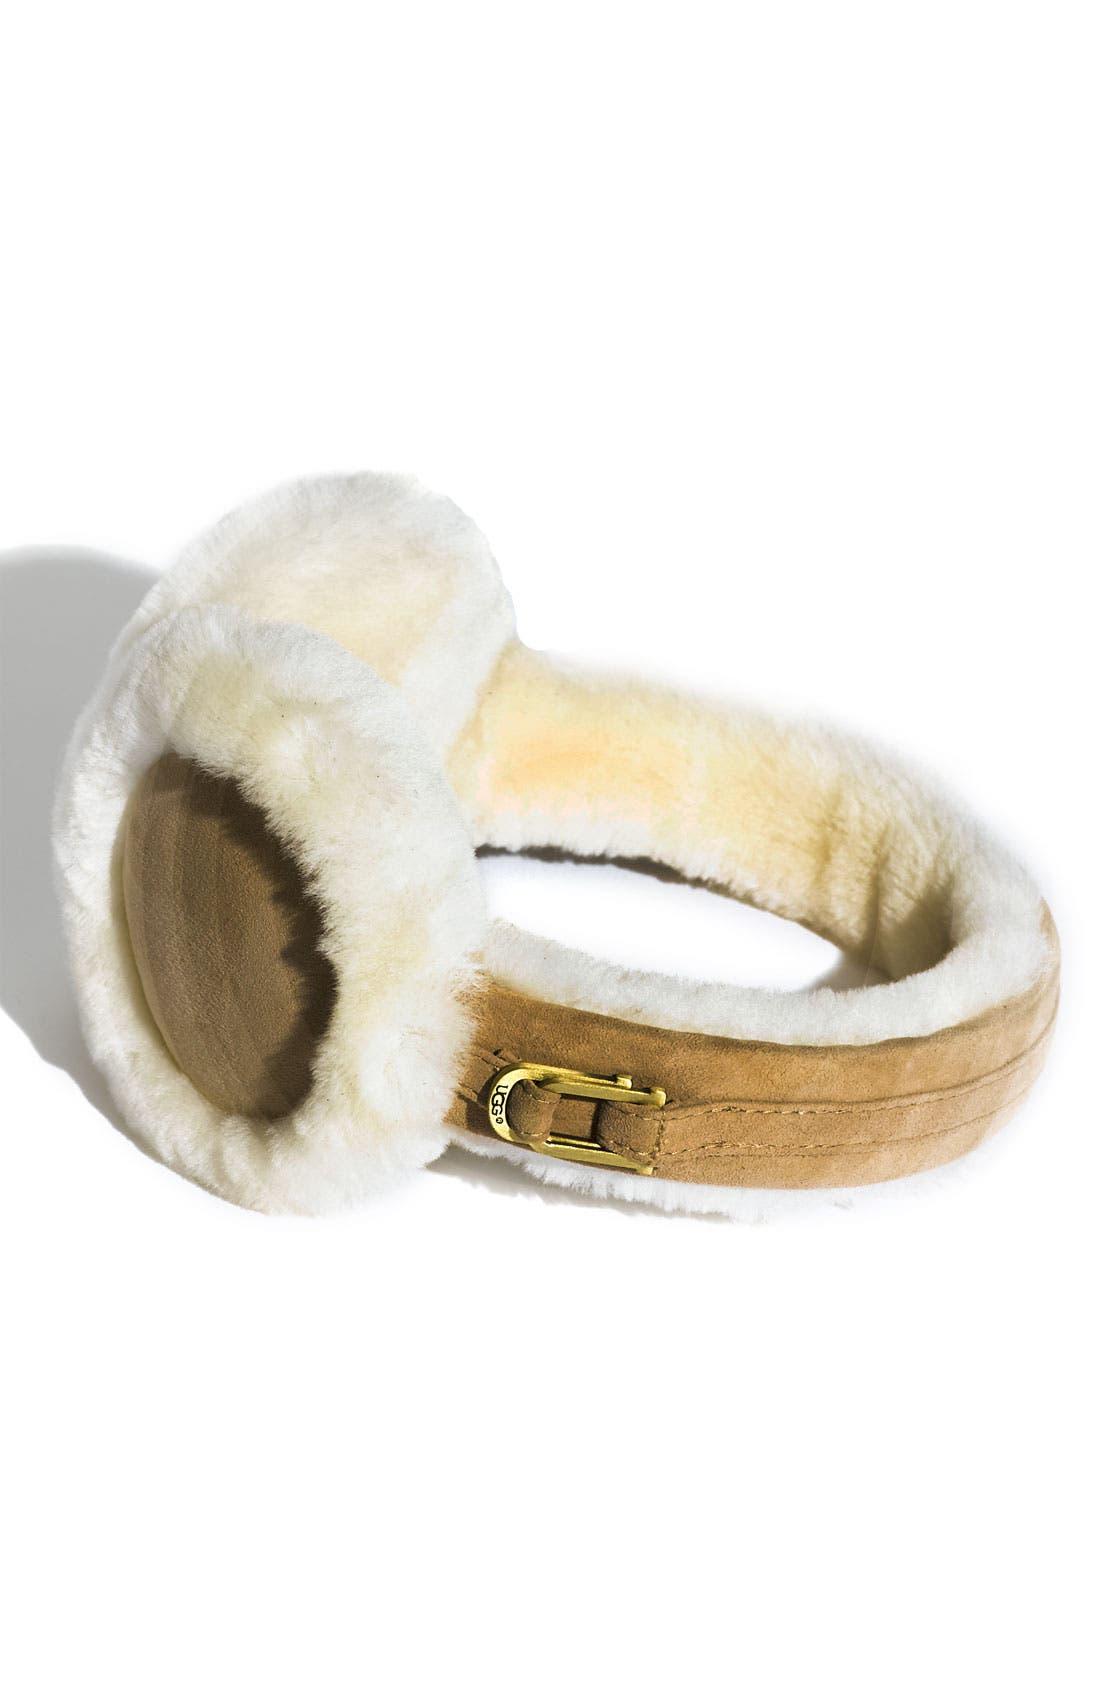 Alternate Image 1 Selected - UGG® Australia Double 'U' Shearling Earmuffs